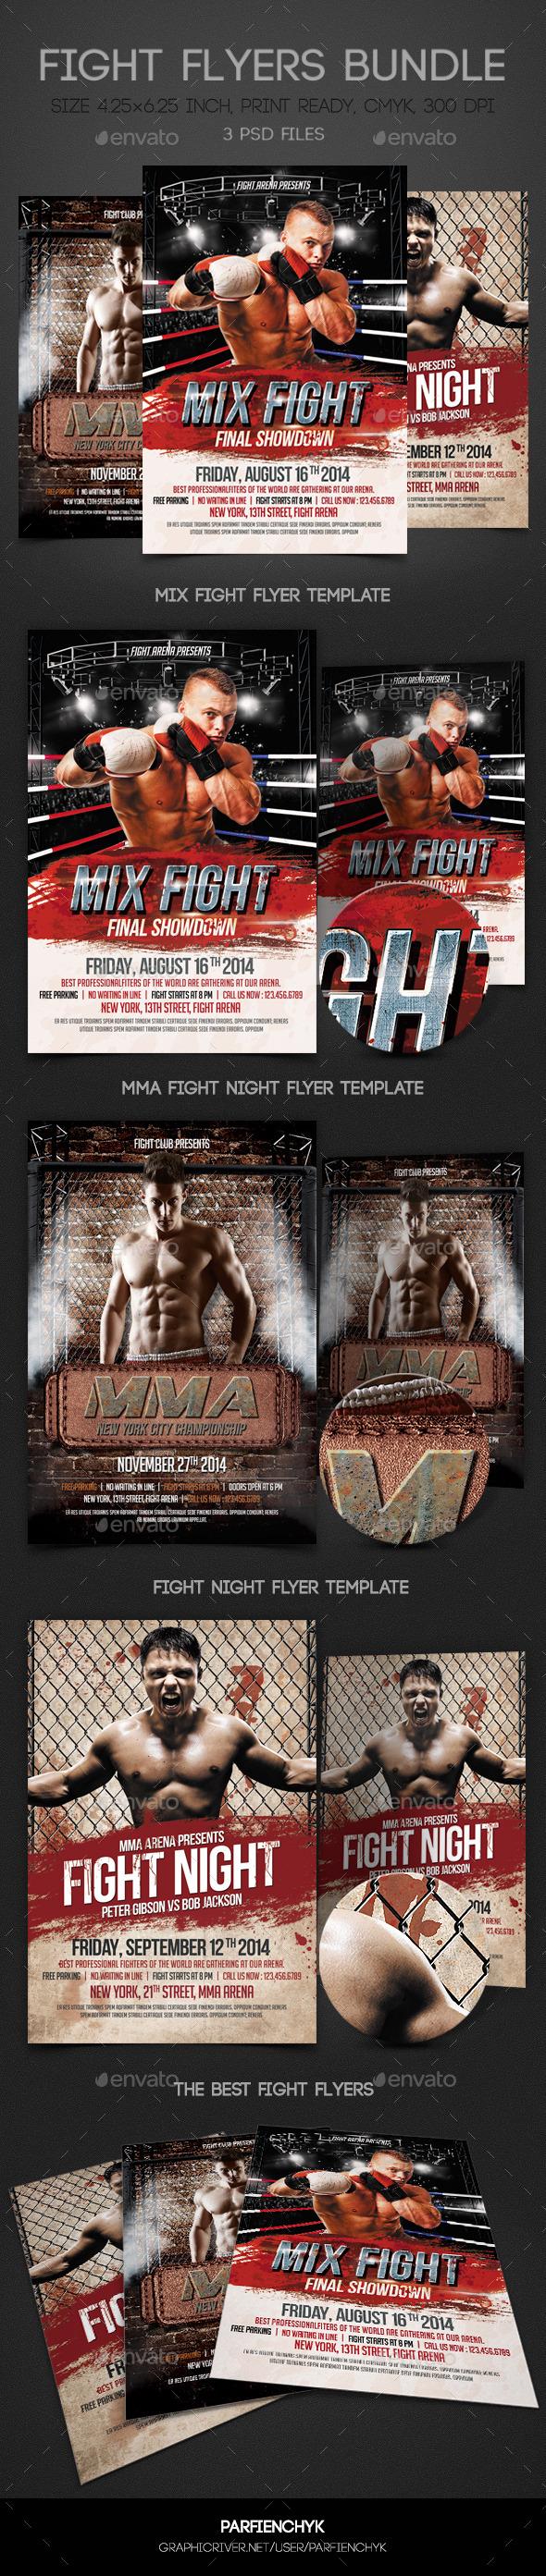 GraphicRiver Fight Flyers Bundle 9094345